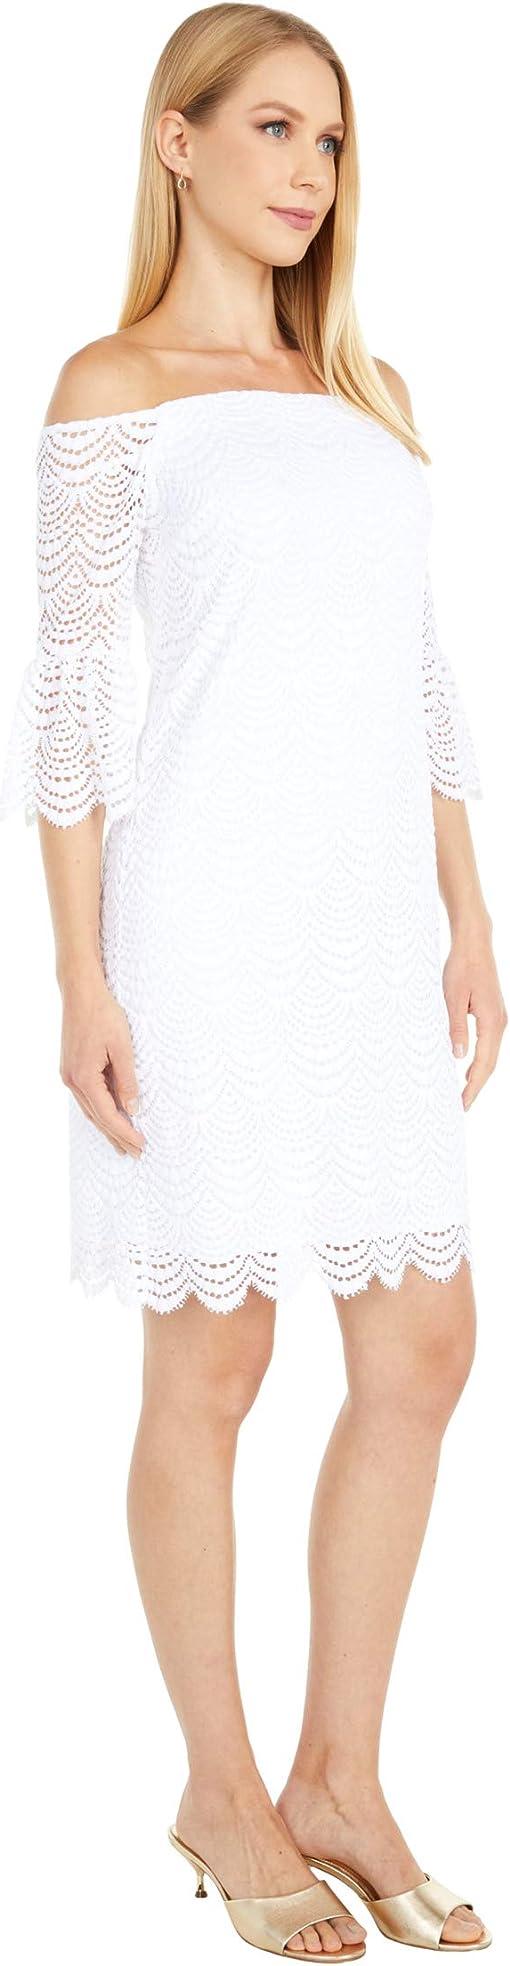 Resort White Scalloped Shell Lace